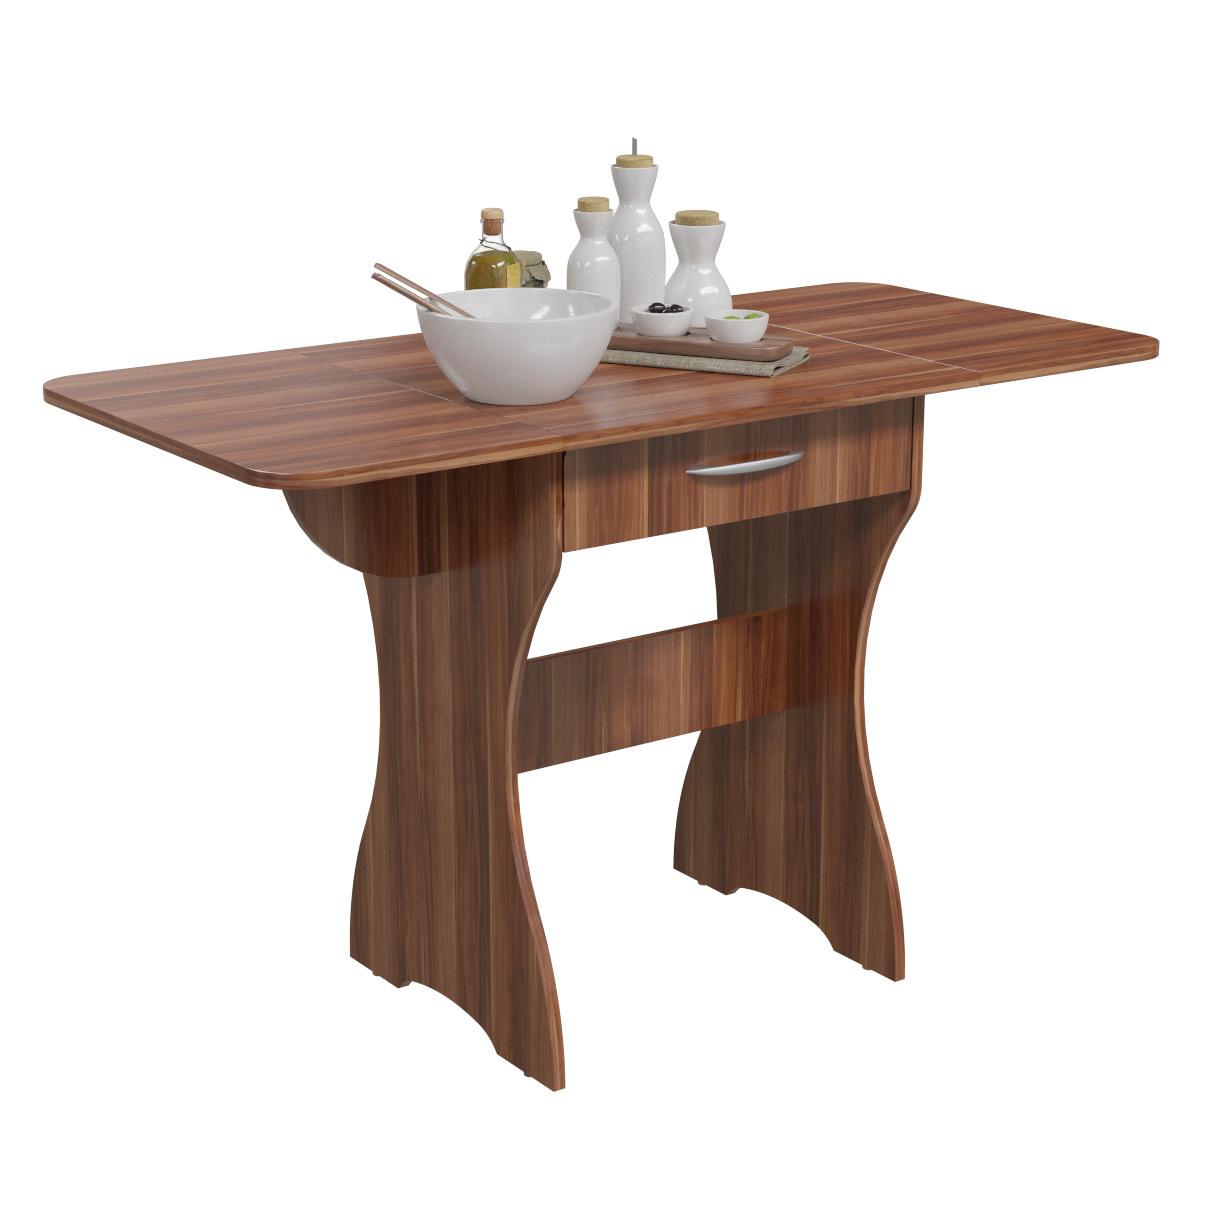 Стол обеденный раскладной с ящиком Гранд-Кволити 6-02.120 слива, 120х57х75 см фото